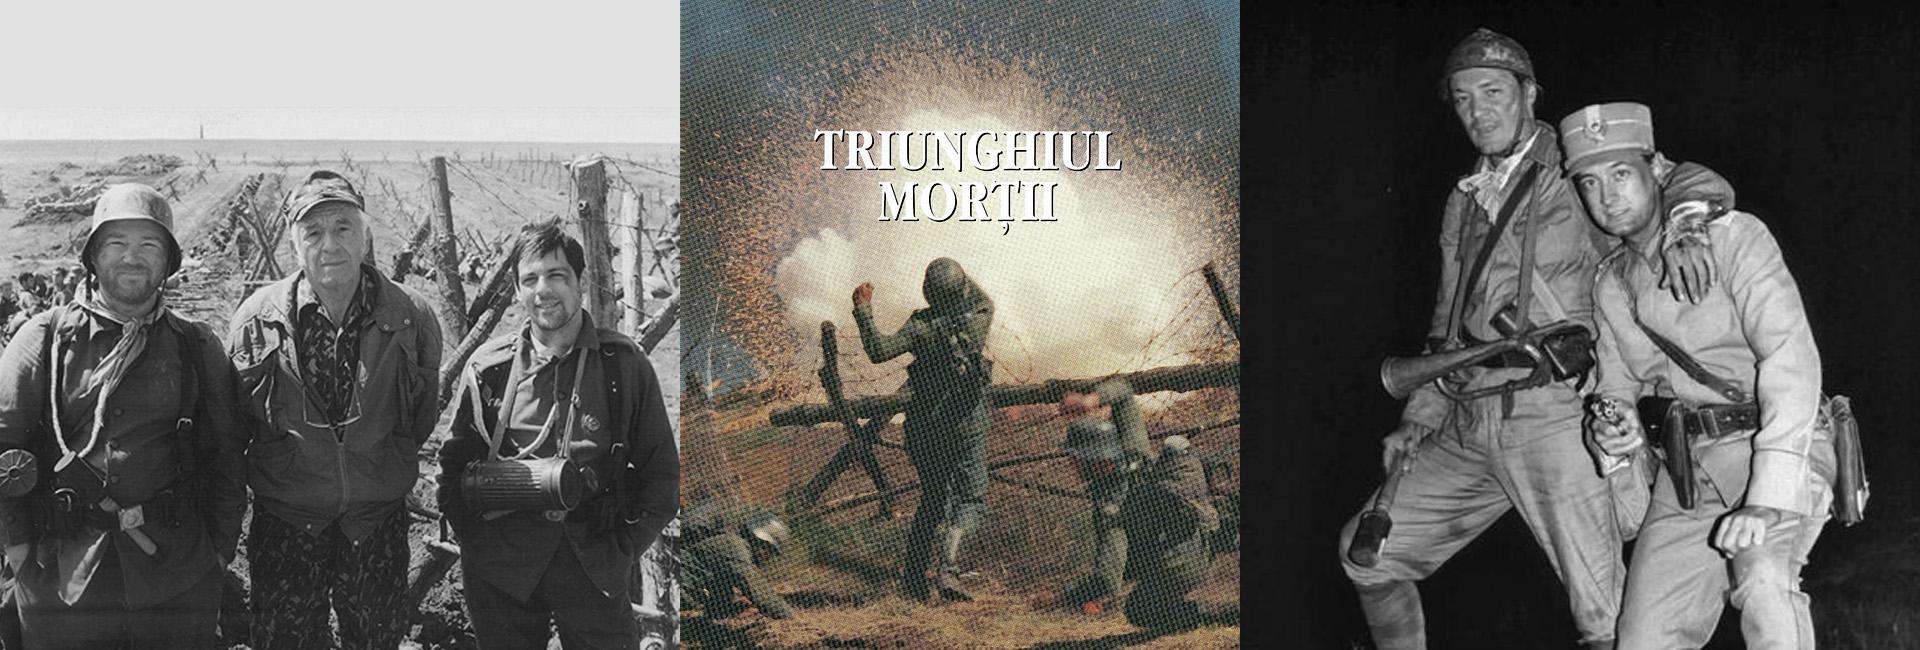 Sergiu Nicolaescu Triunghiul Morţii film istoric România Primul Război Mondial slider